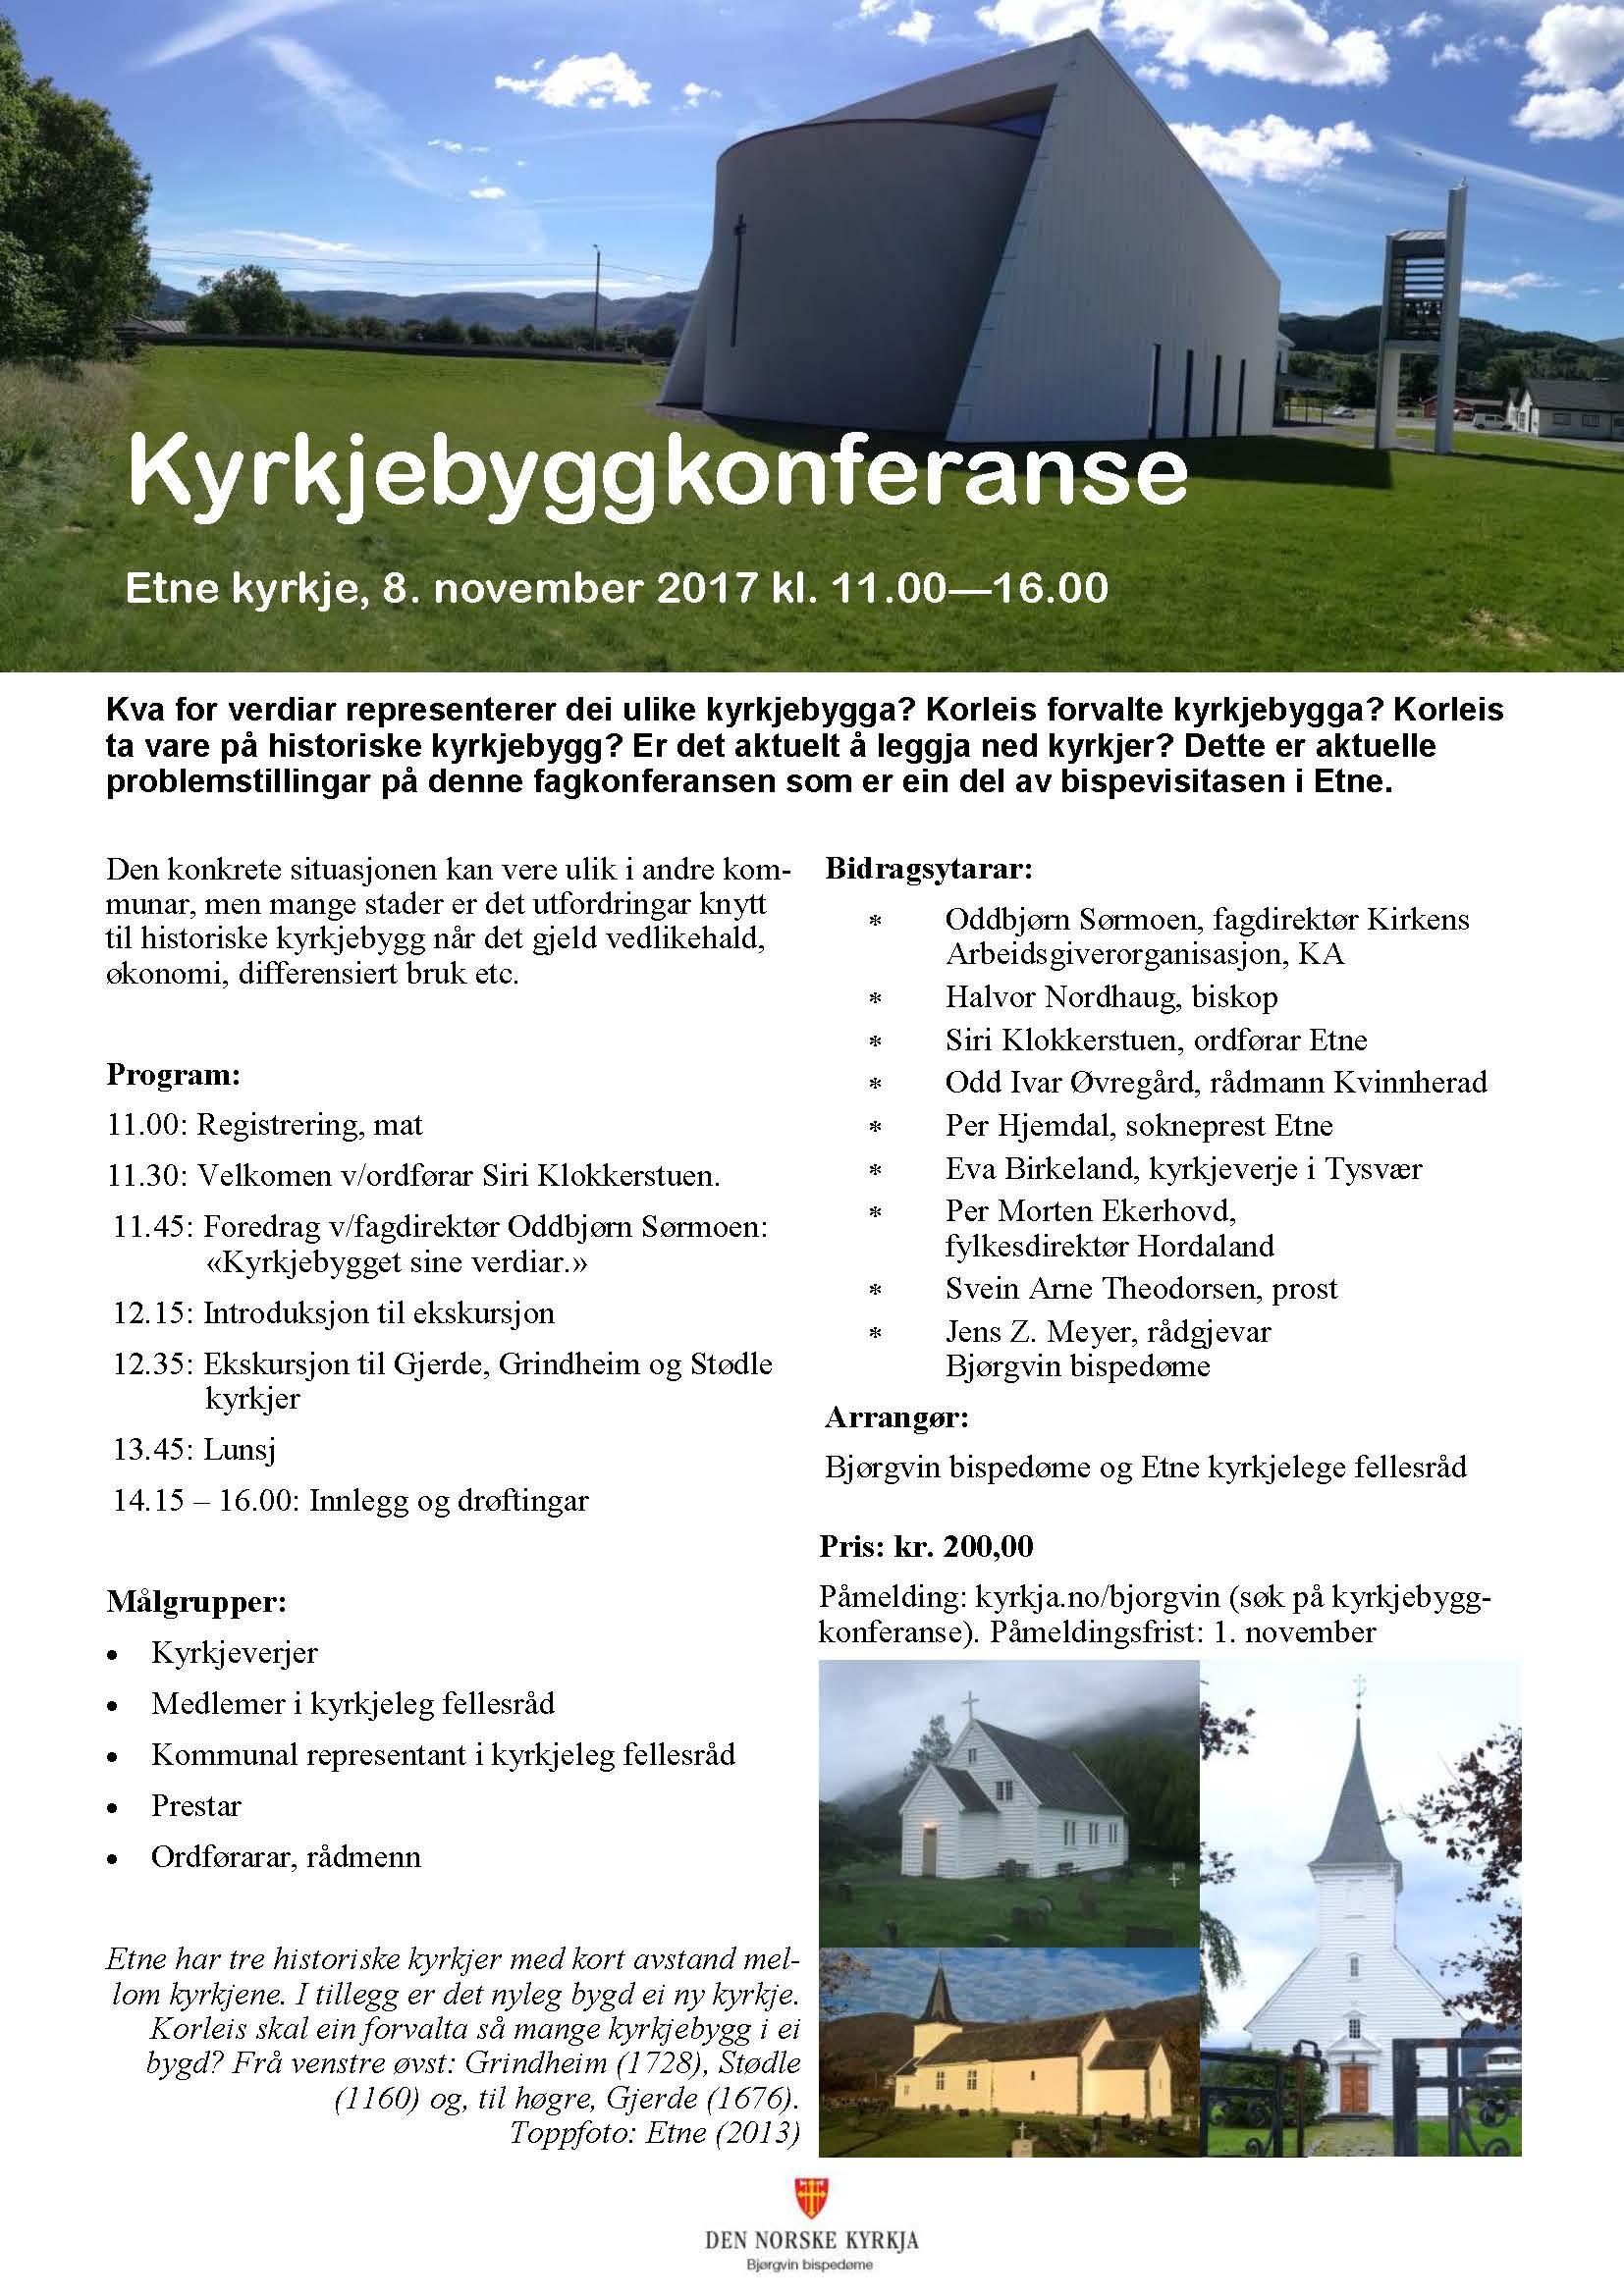 Kyrkjebyggkonferanse Etne 2017 Løpeseddel.jpg